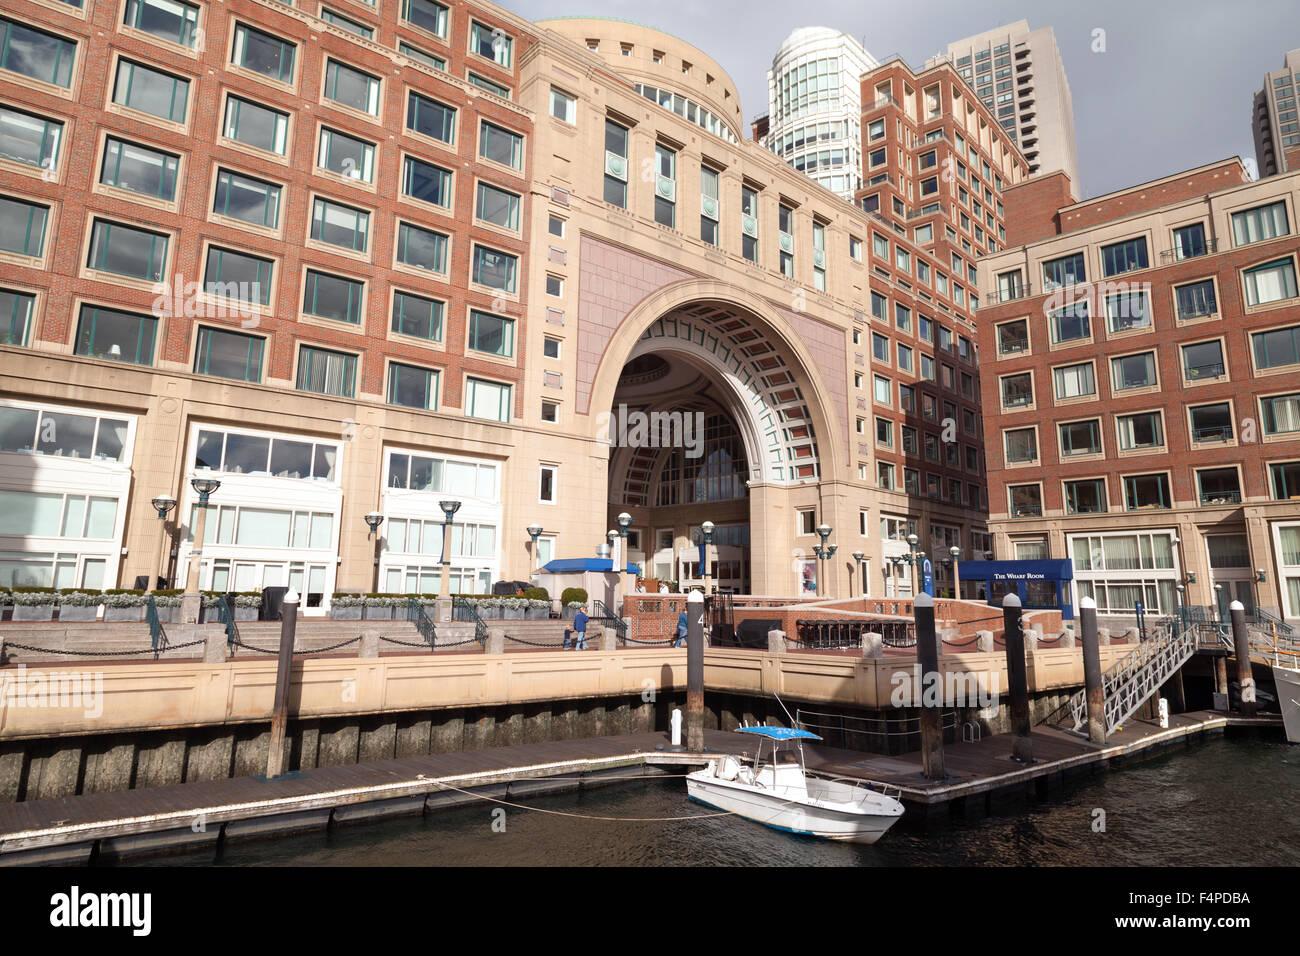 El lujoso Hotel Boston Harbor, Rowes Wharf, Boston, Massachusetts EE.UU. Imagen De Stock